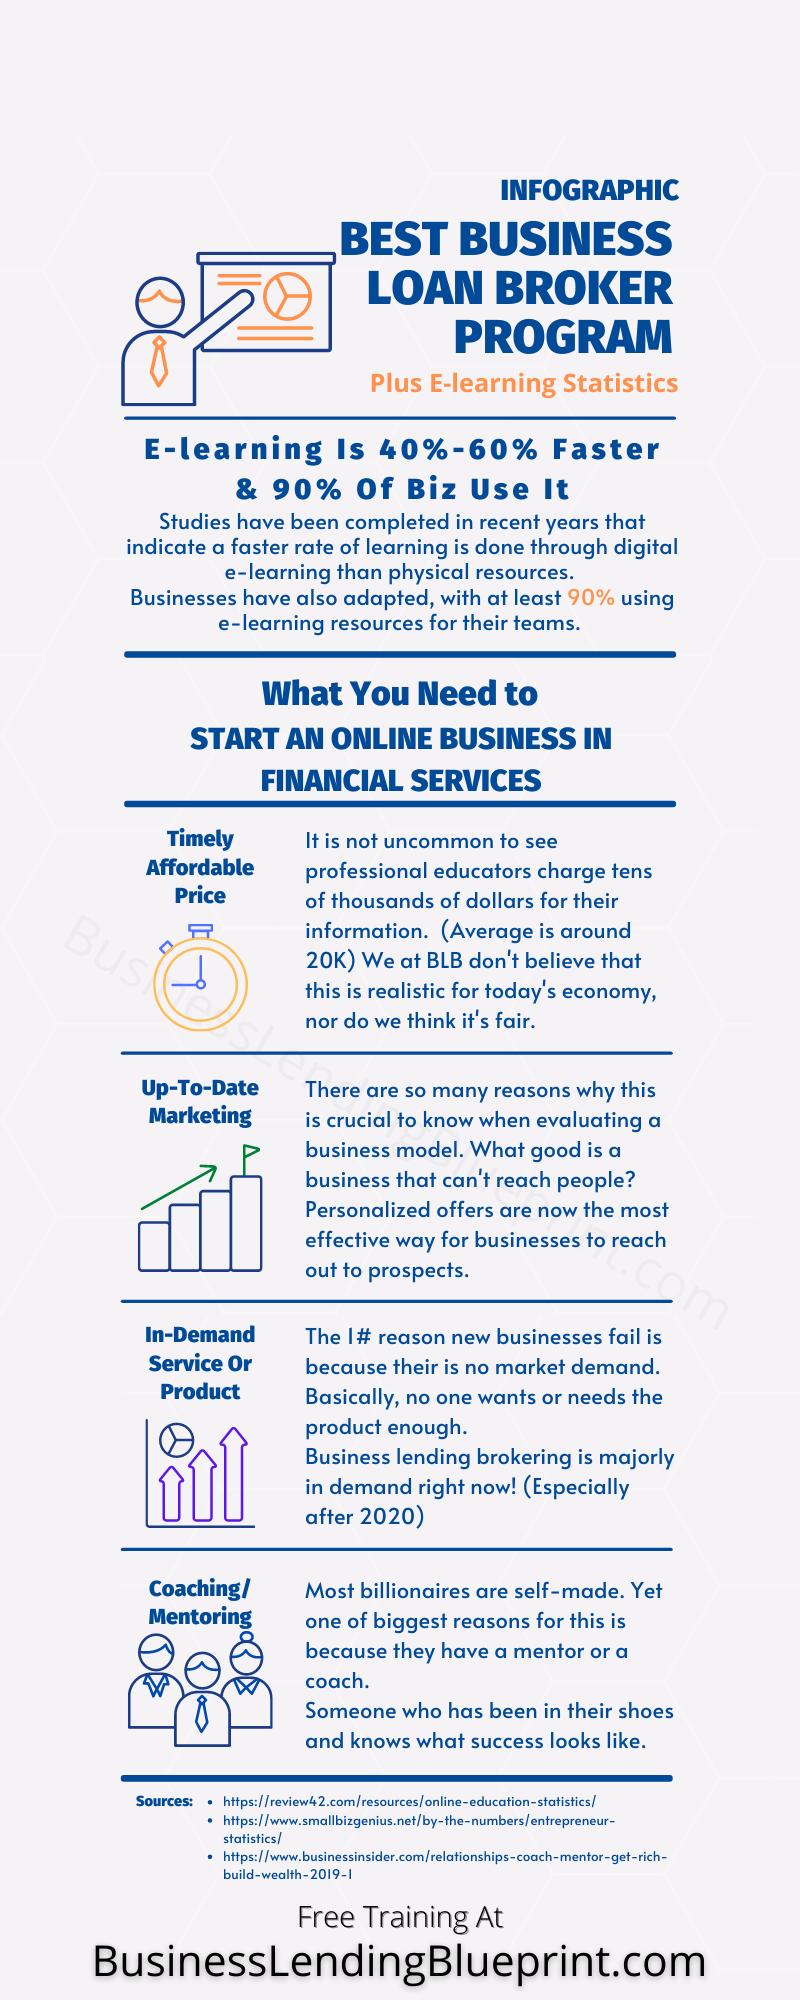 Best Business Loan Broker Program Infographic